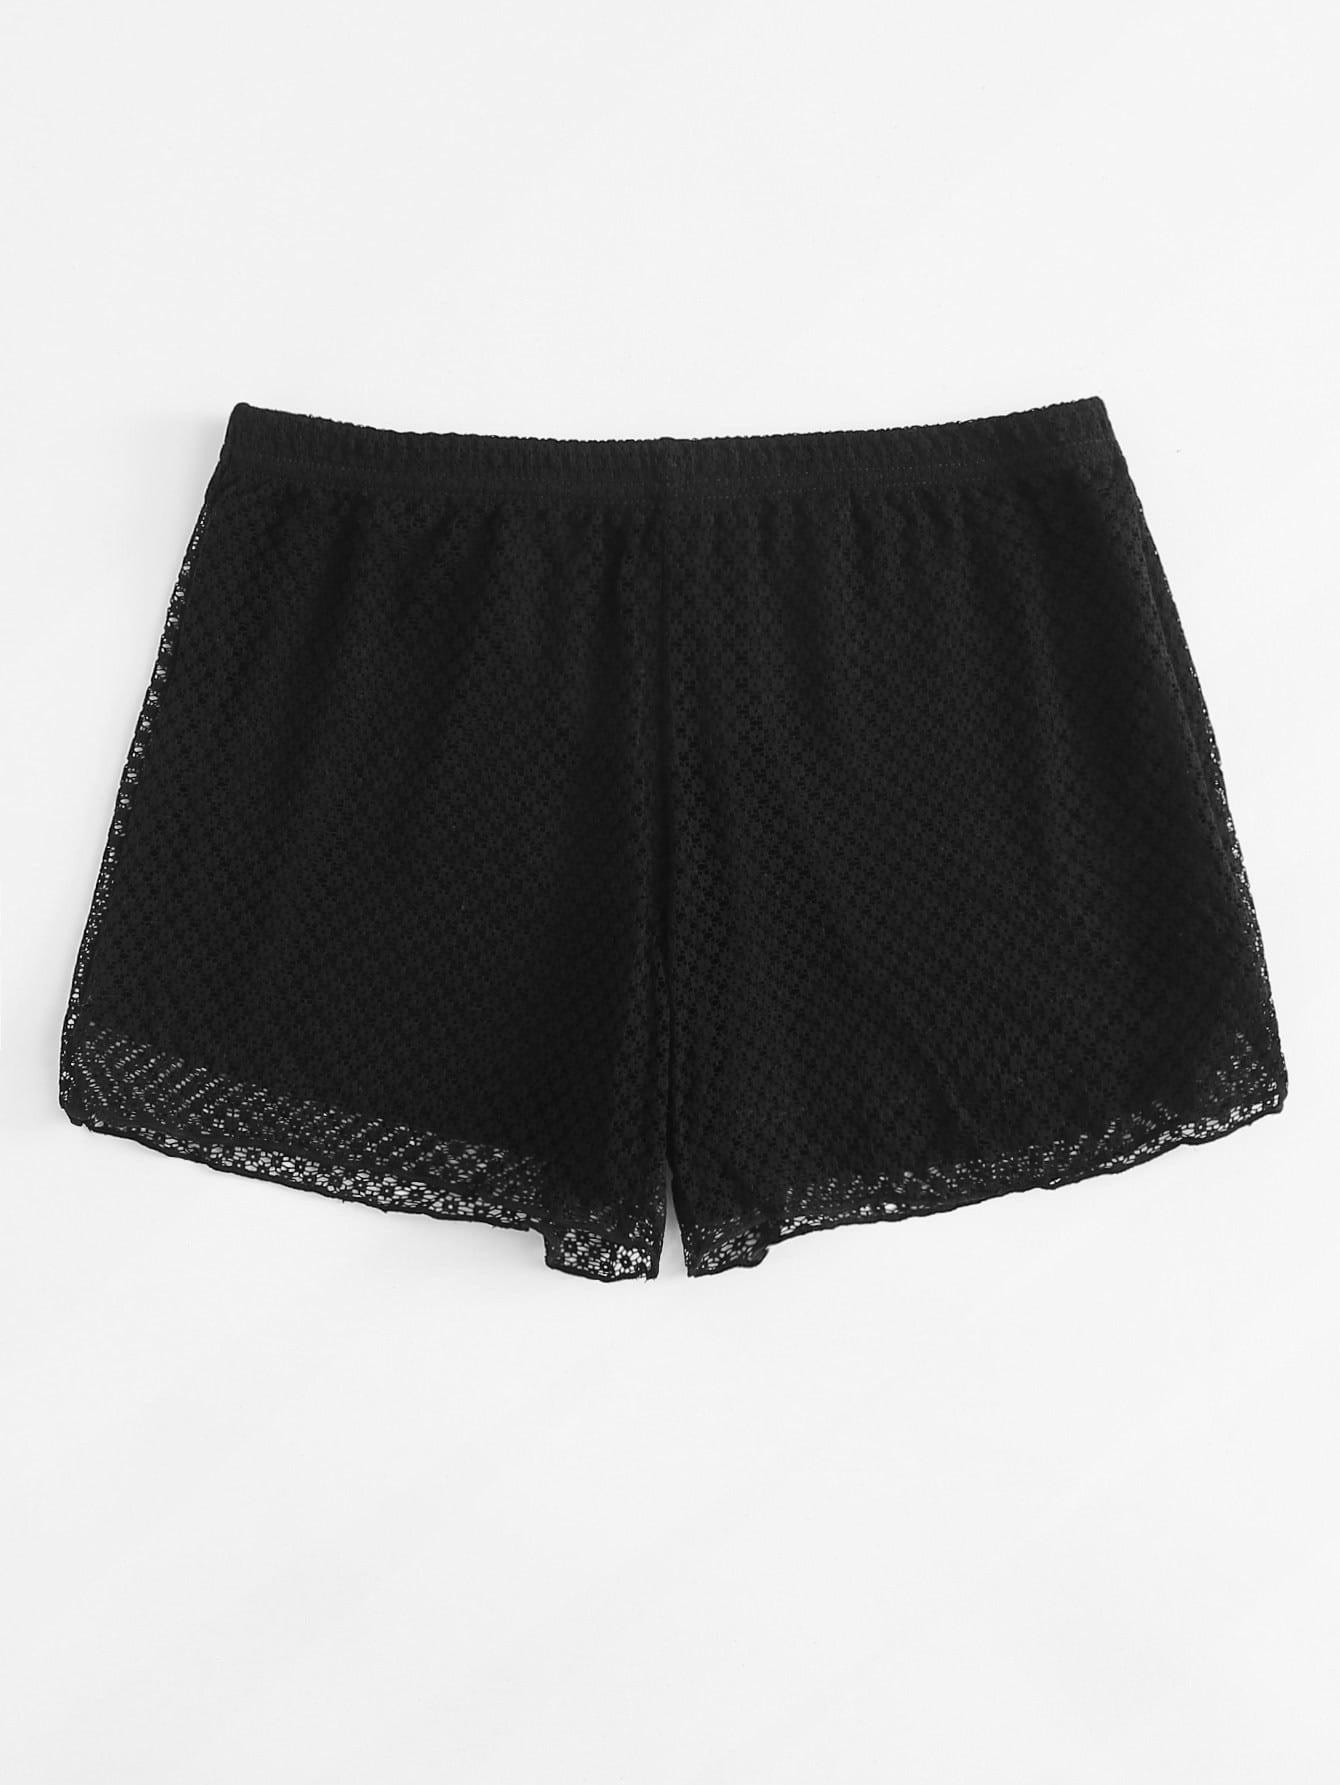 Lace Boyshort Panty lingerie180314473